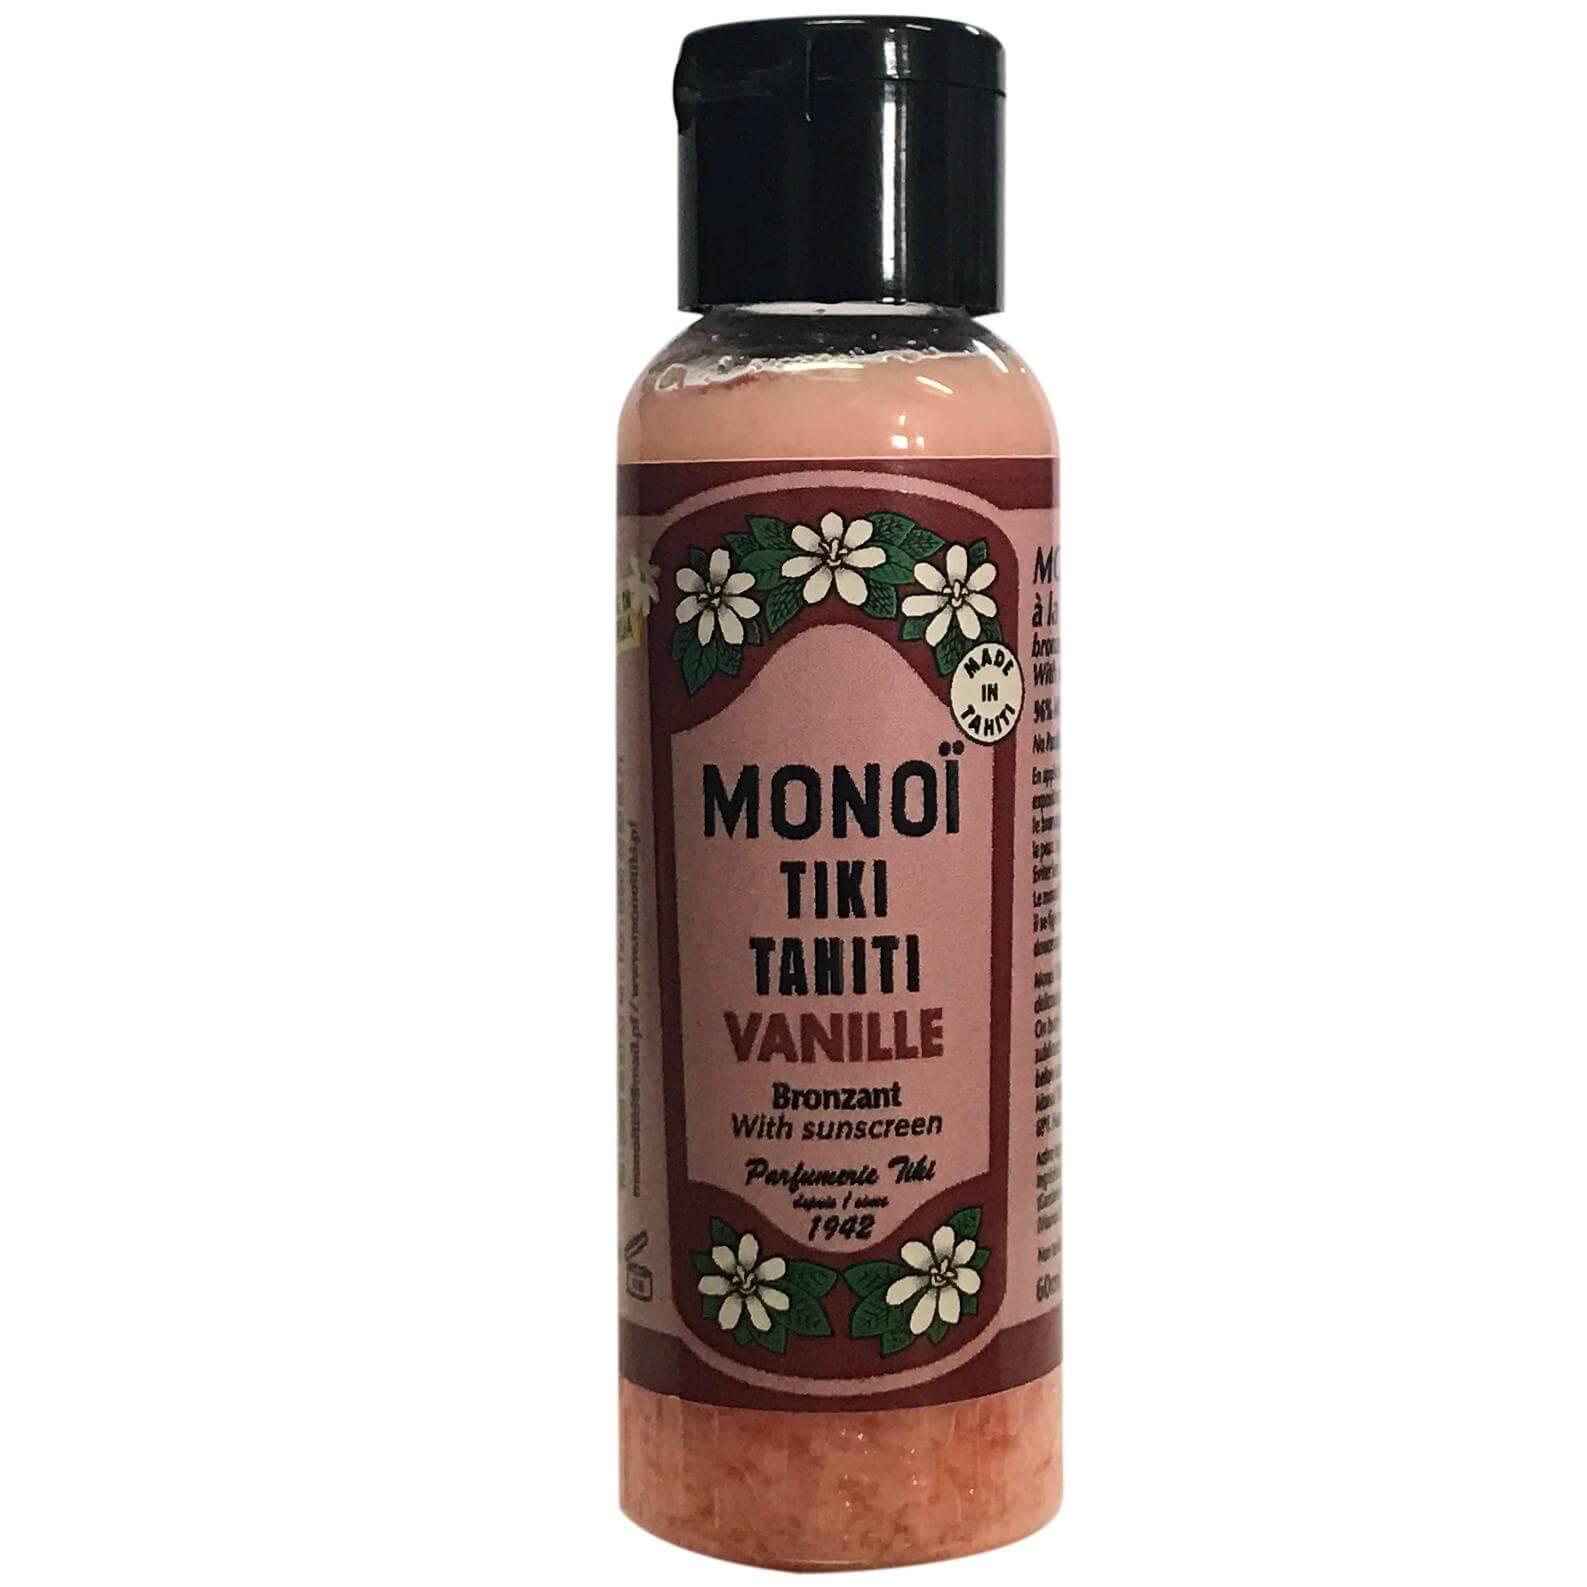 Monoi Tiki Tahiti Vanille Bronzant With Sunscreen Αντηλιακό Λάδι Μαυρίσματος με Άρωμα Βανίλιας 60ml